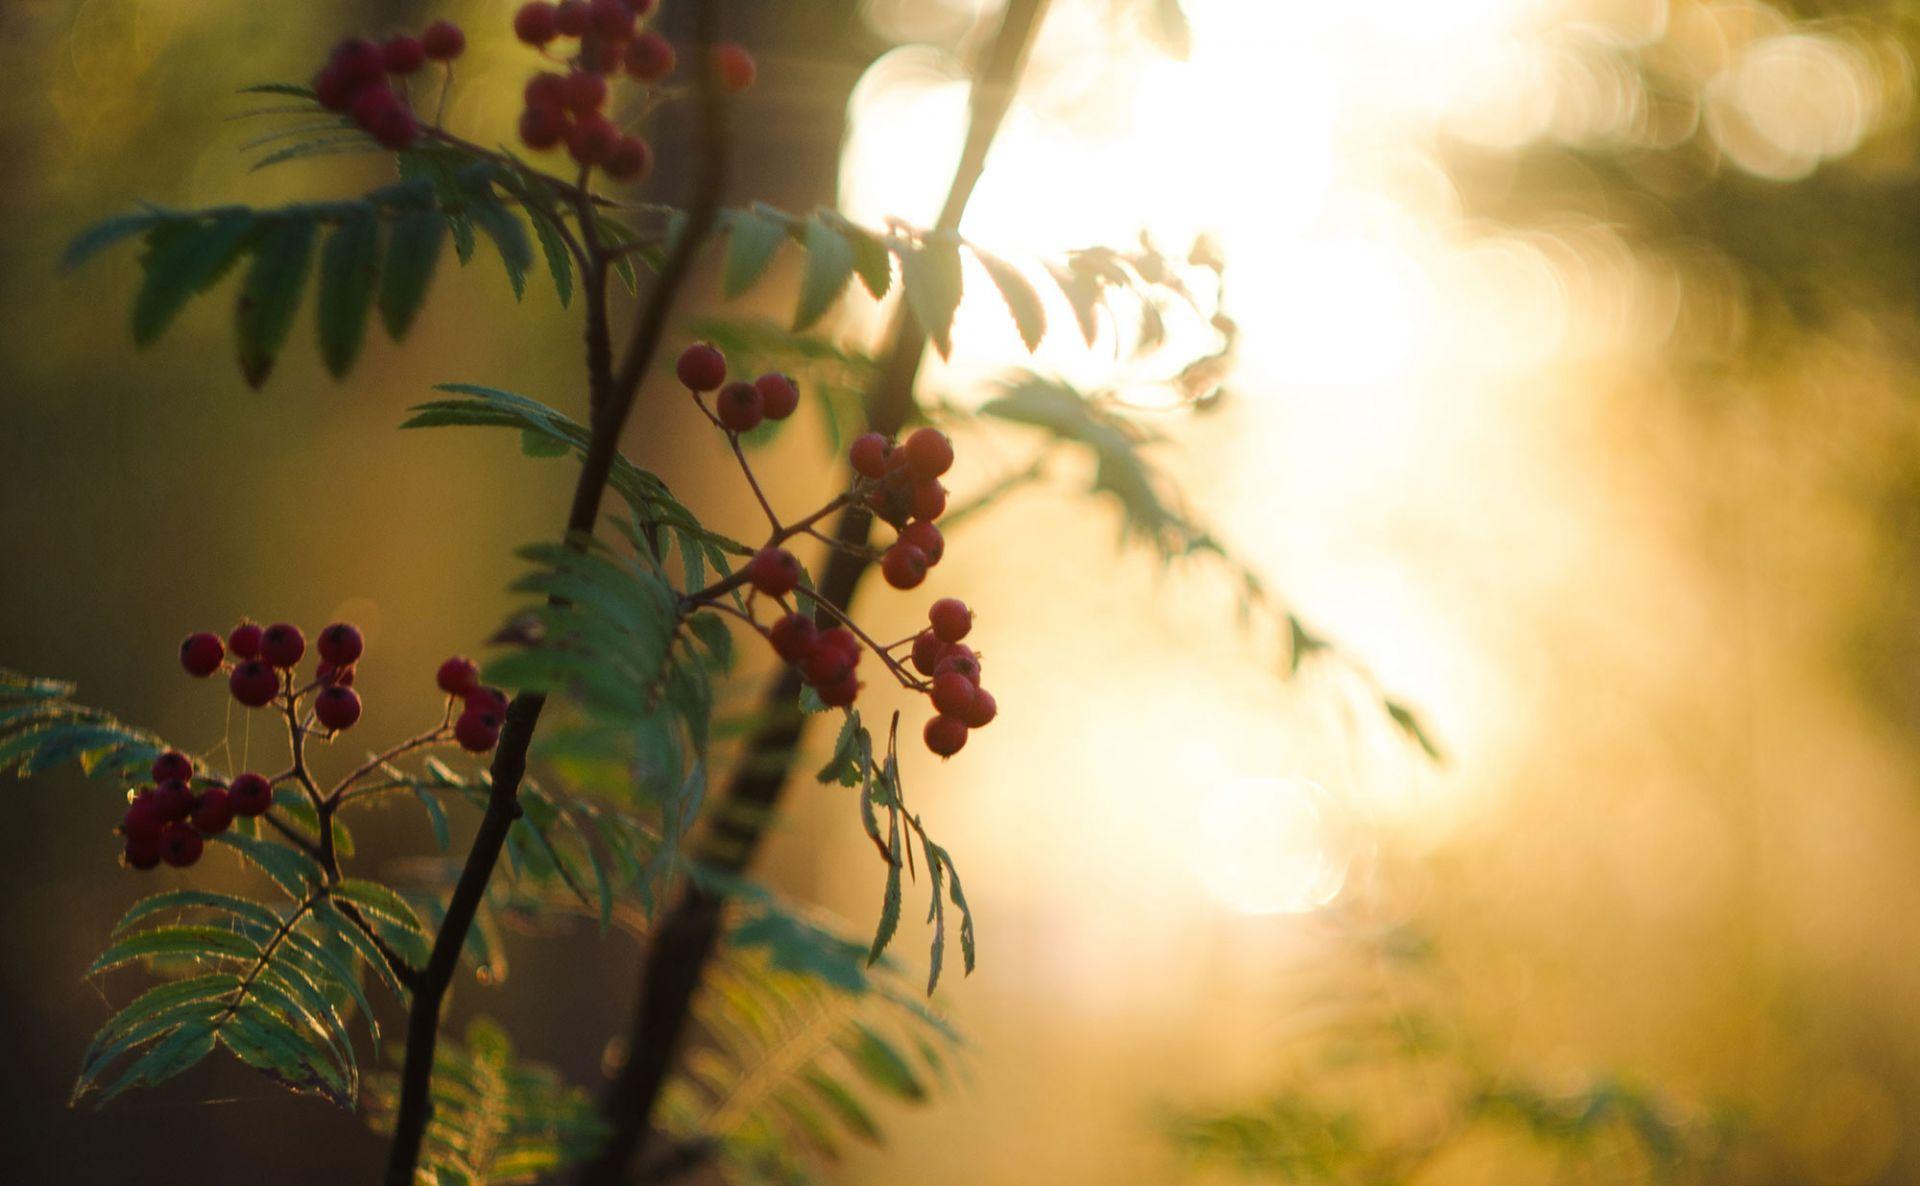 Pihlajanmarjoja ilta-auringossa.